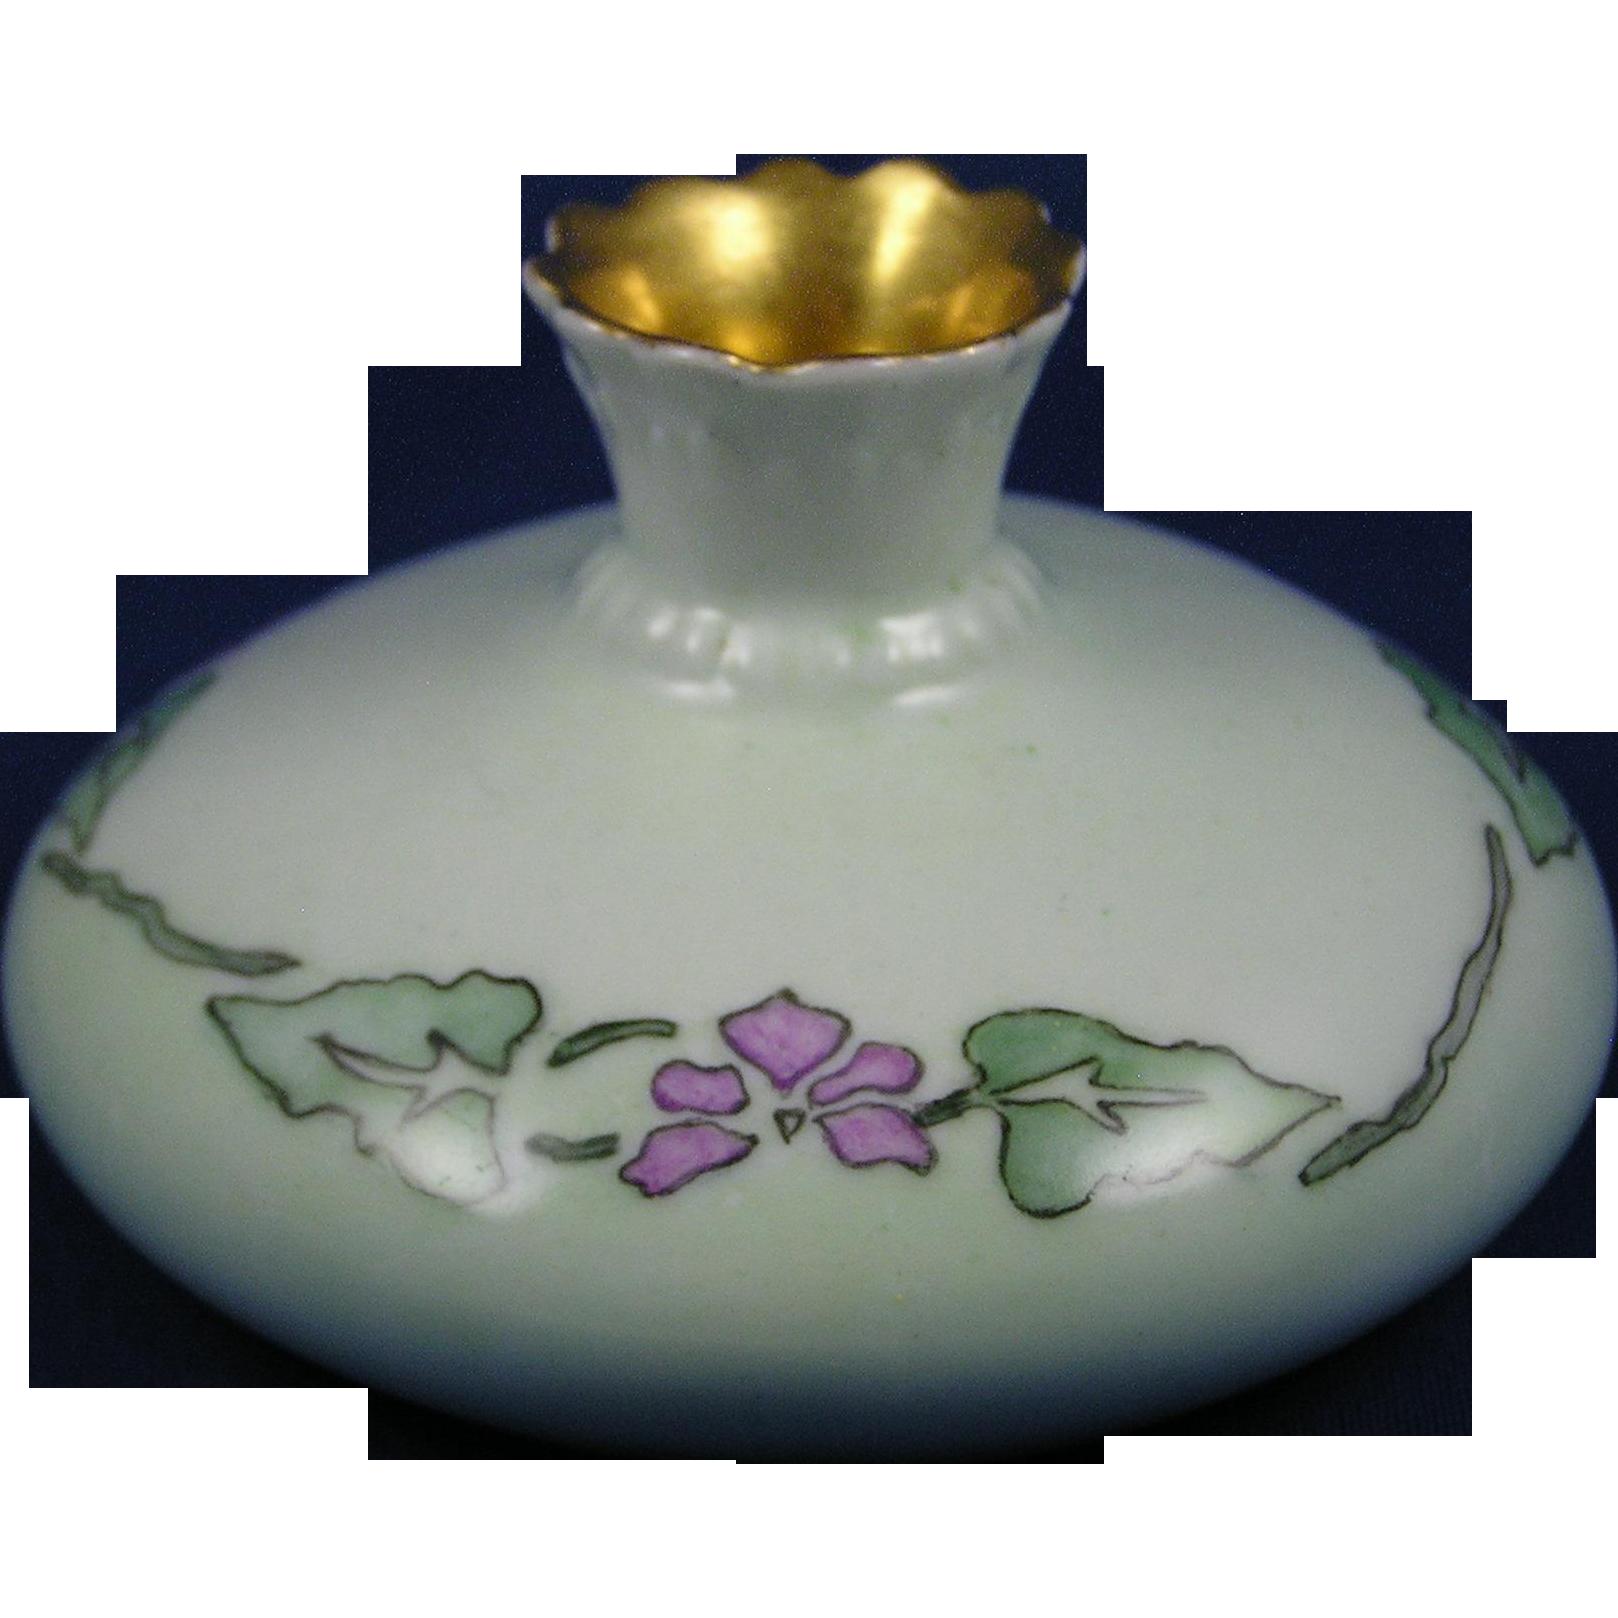 PH Leonard Austria Arts & Crafts Floral Motif Vase (c.1890-1908)